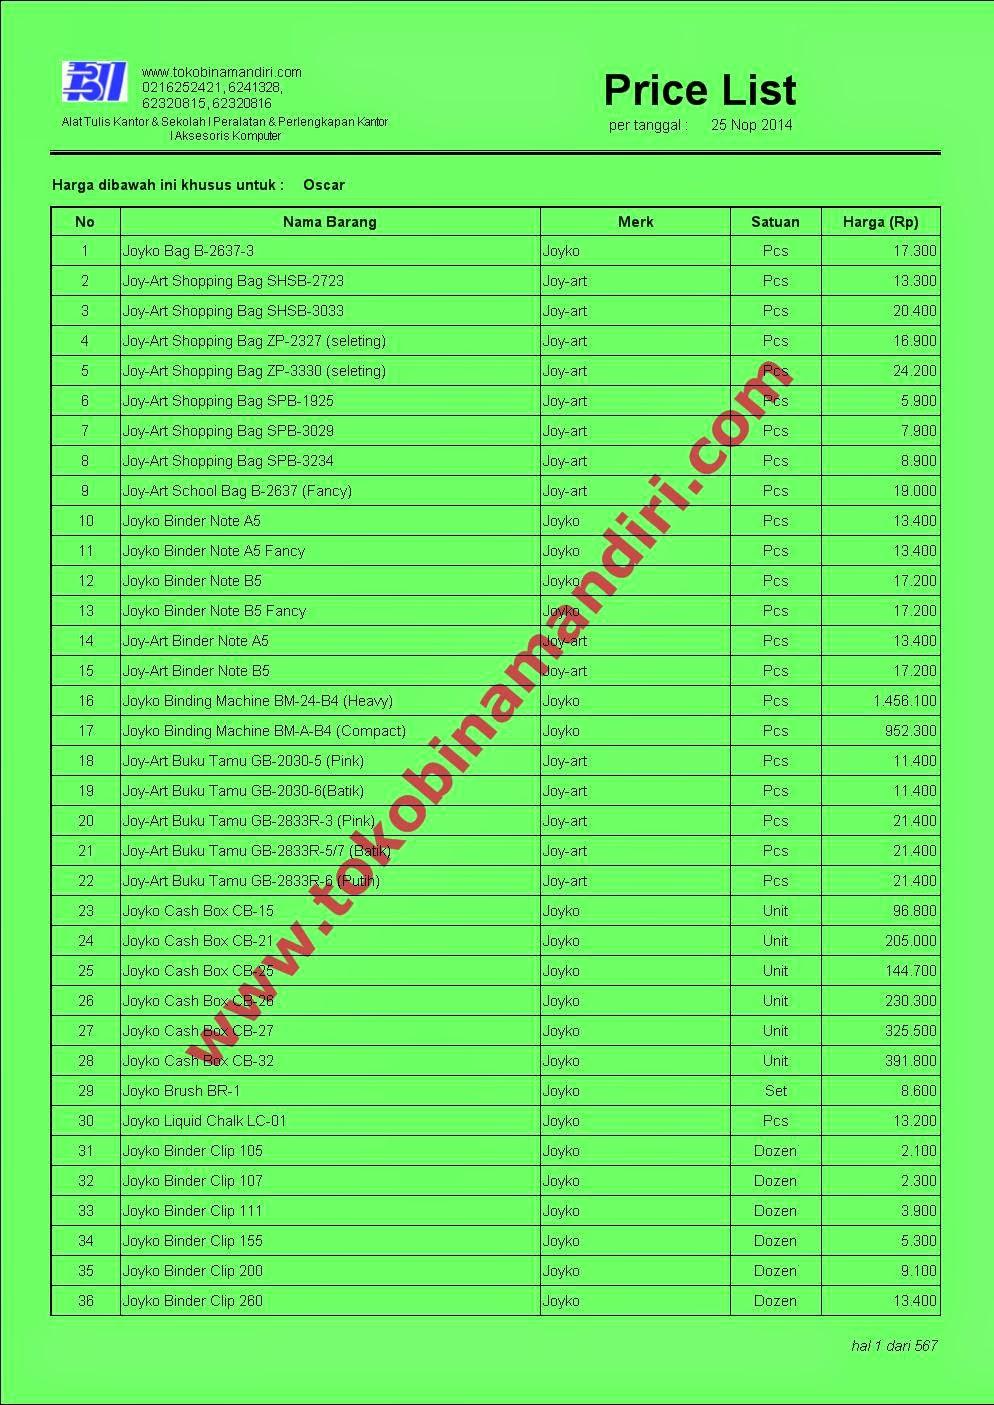 Daftar Harga ATK Joyko Binder Clip, Buku Tamu, Cashbox dll